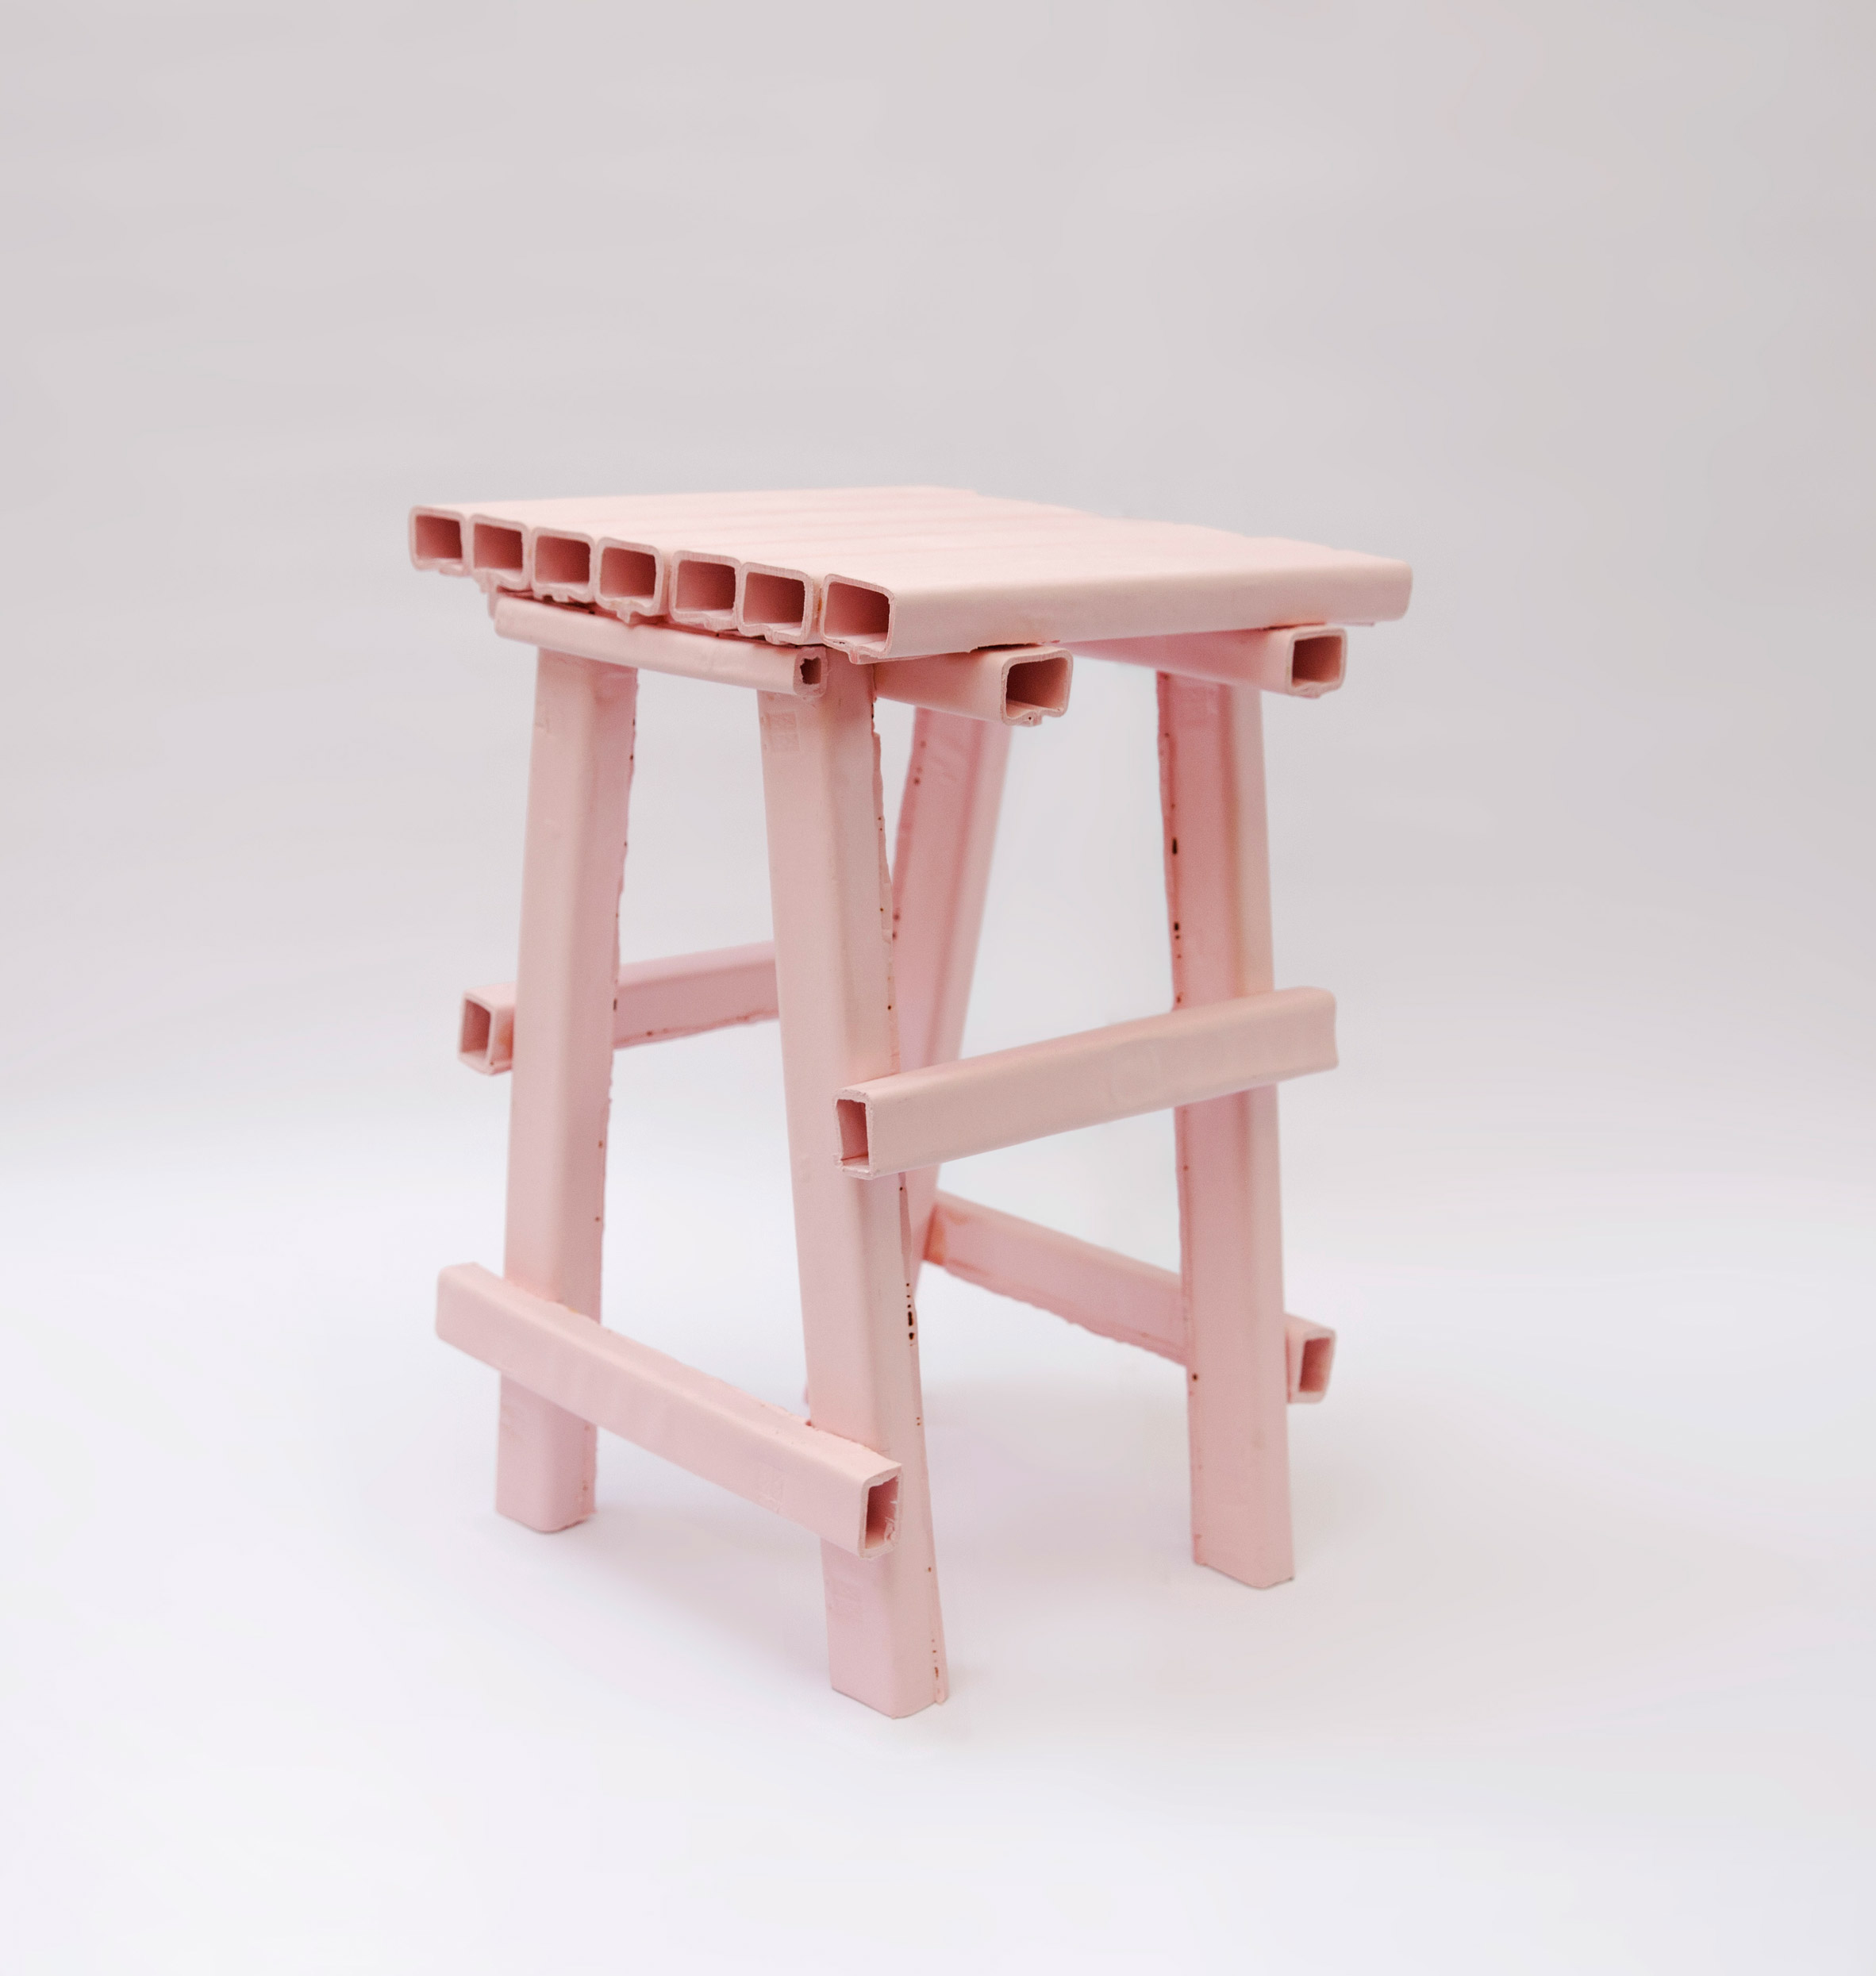 Furnitures Made of Paper by Ying Chang – Fubiz Media Design